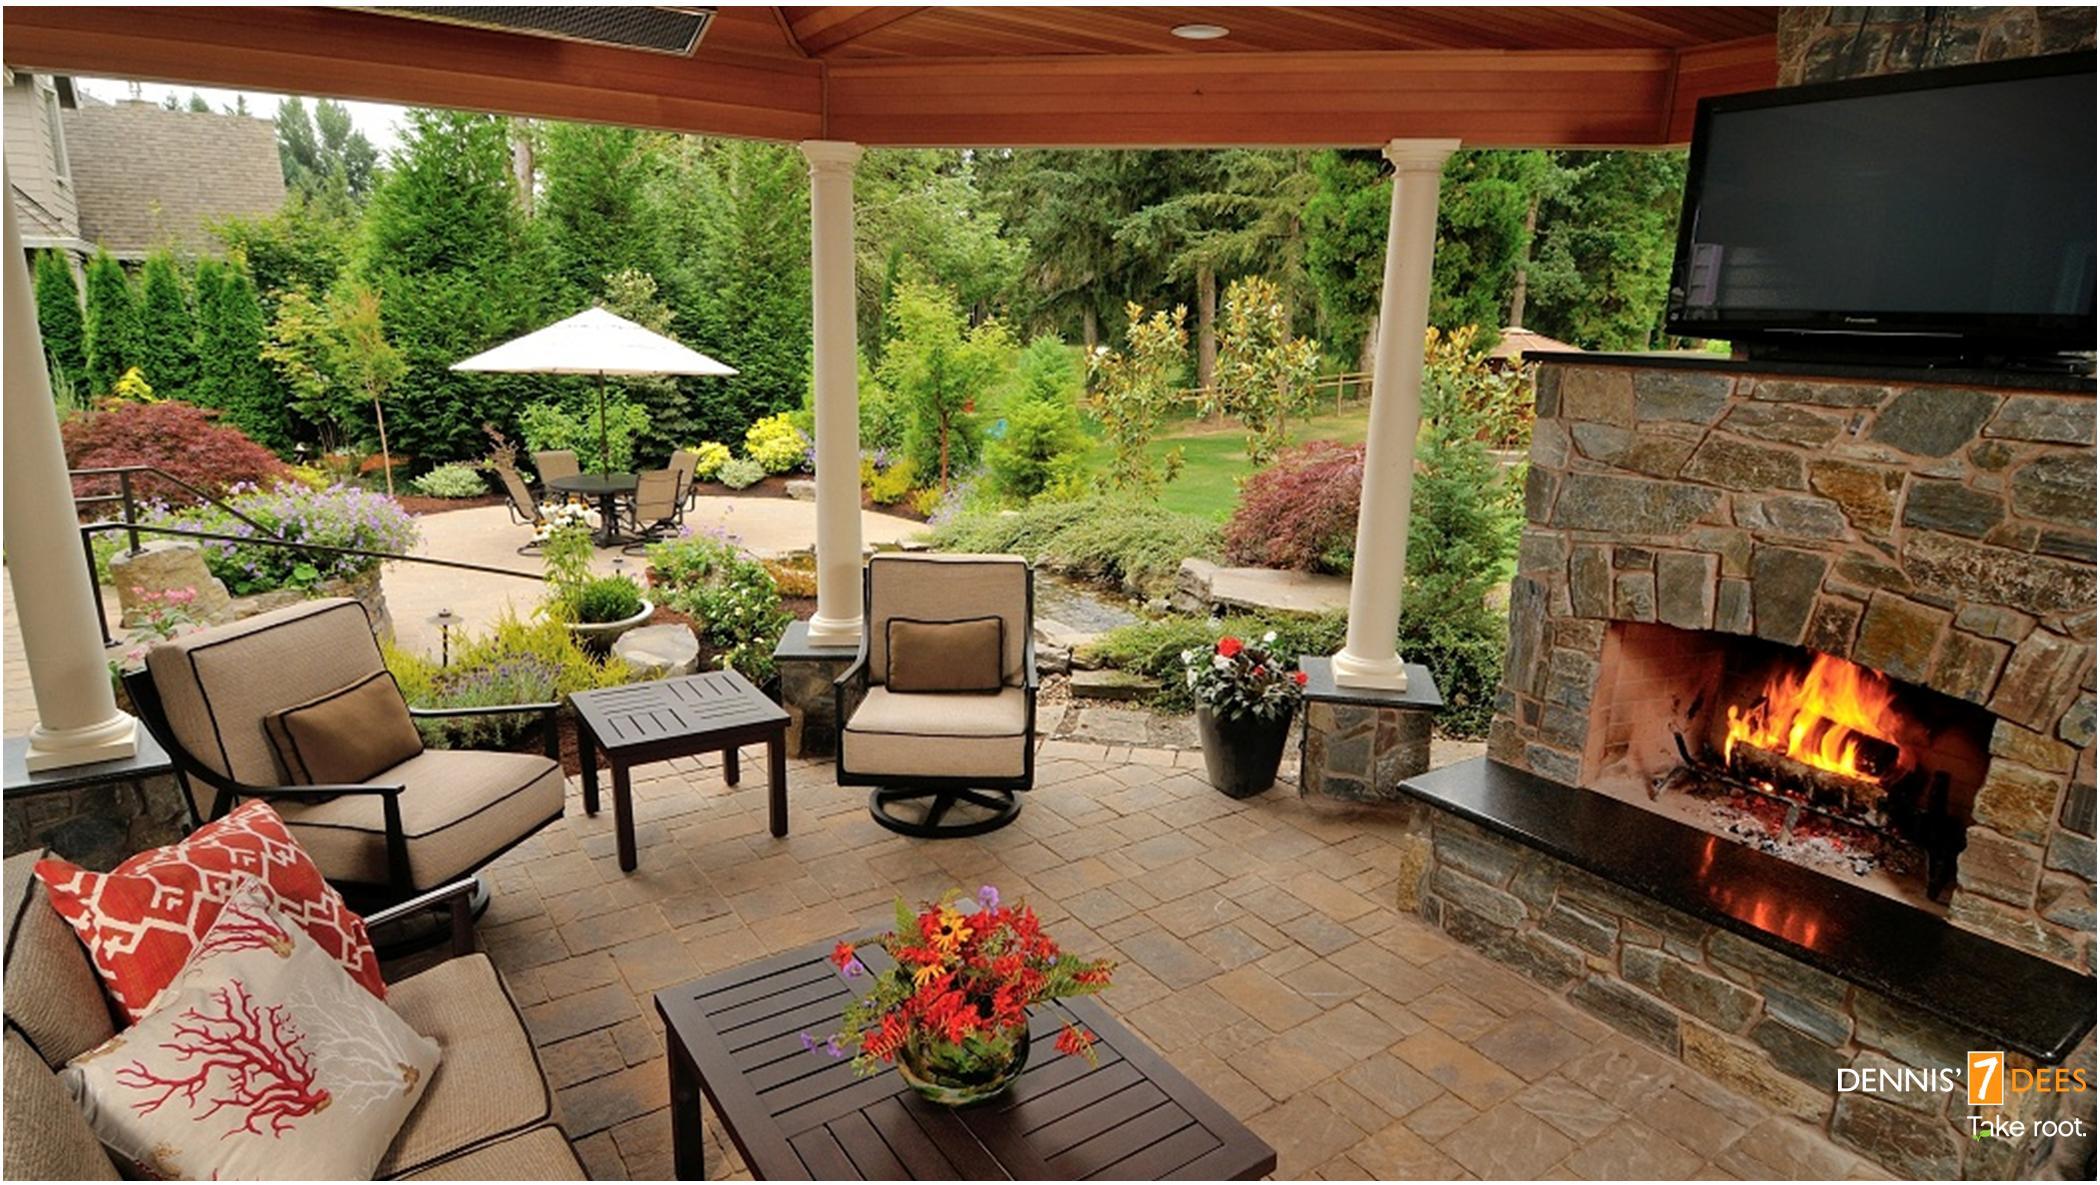 Hermit Haus Redevelopment on Outdoor Kitchen Living Spaces id=30721